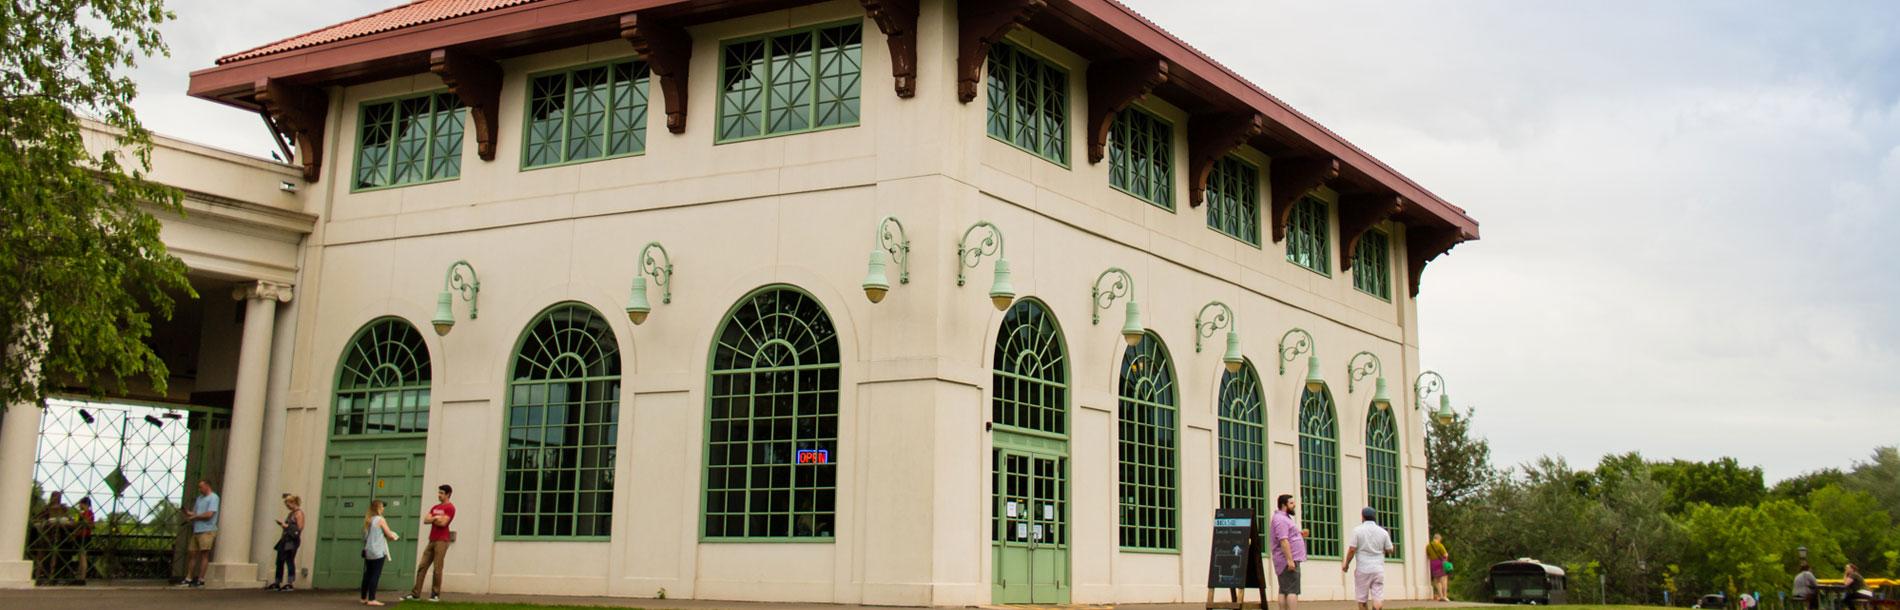 Como Lakeside Pavilion